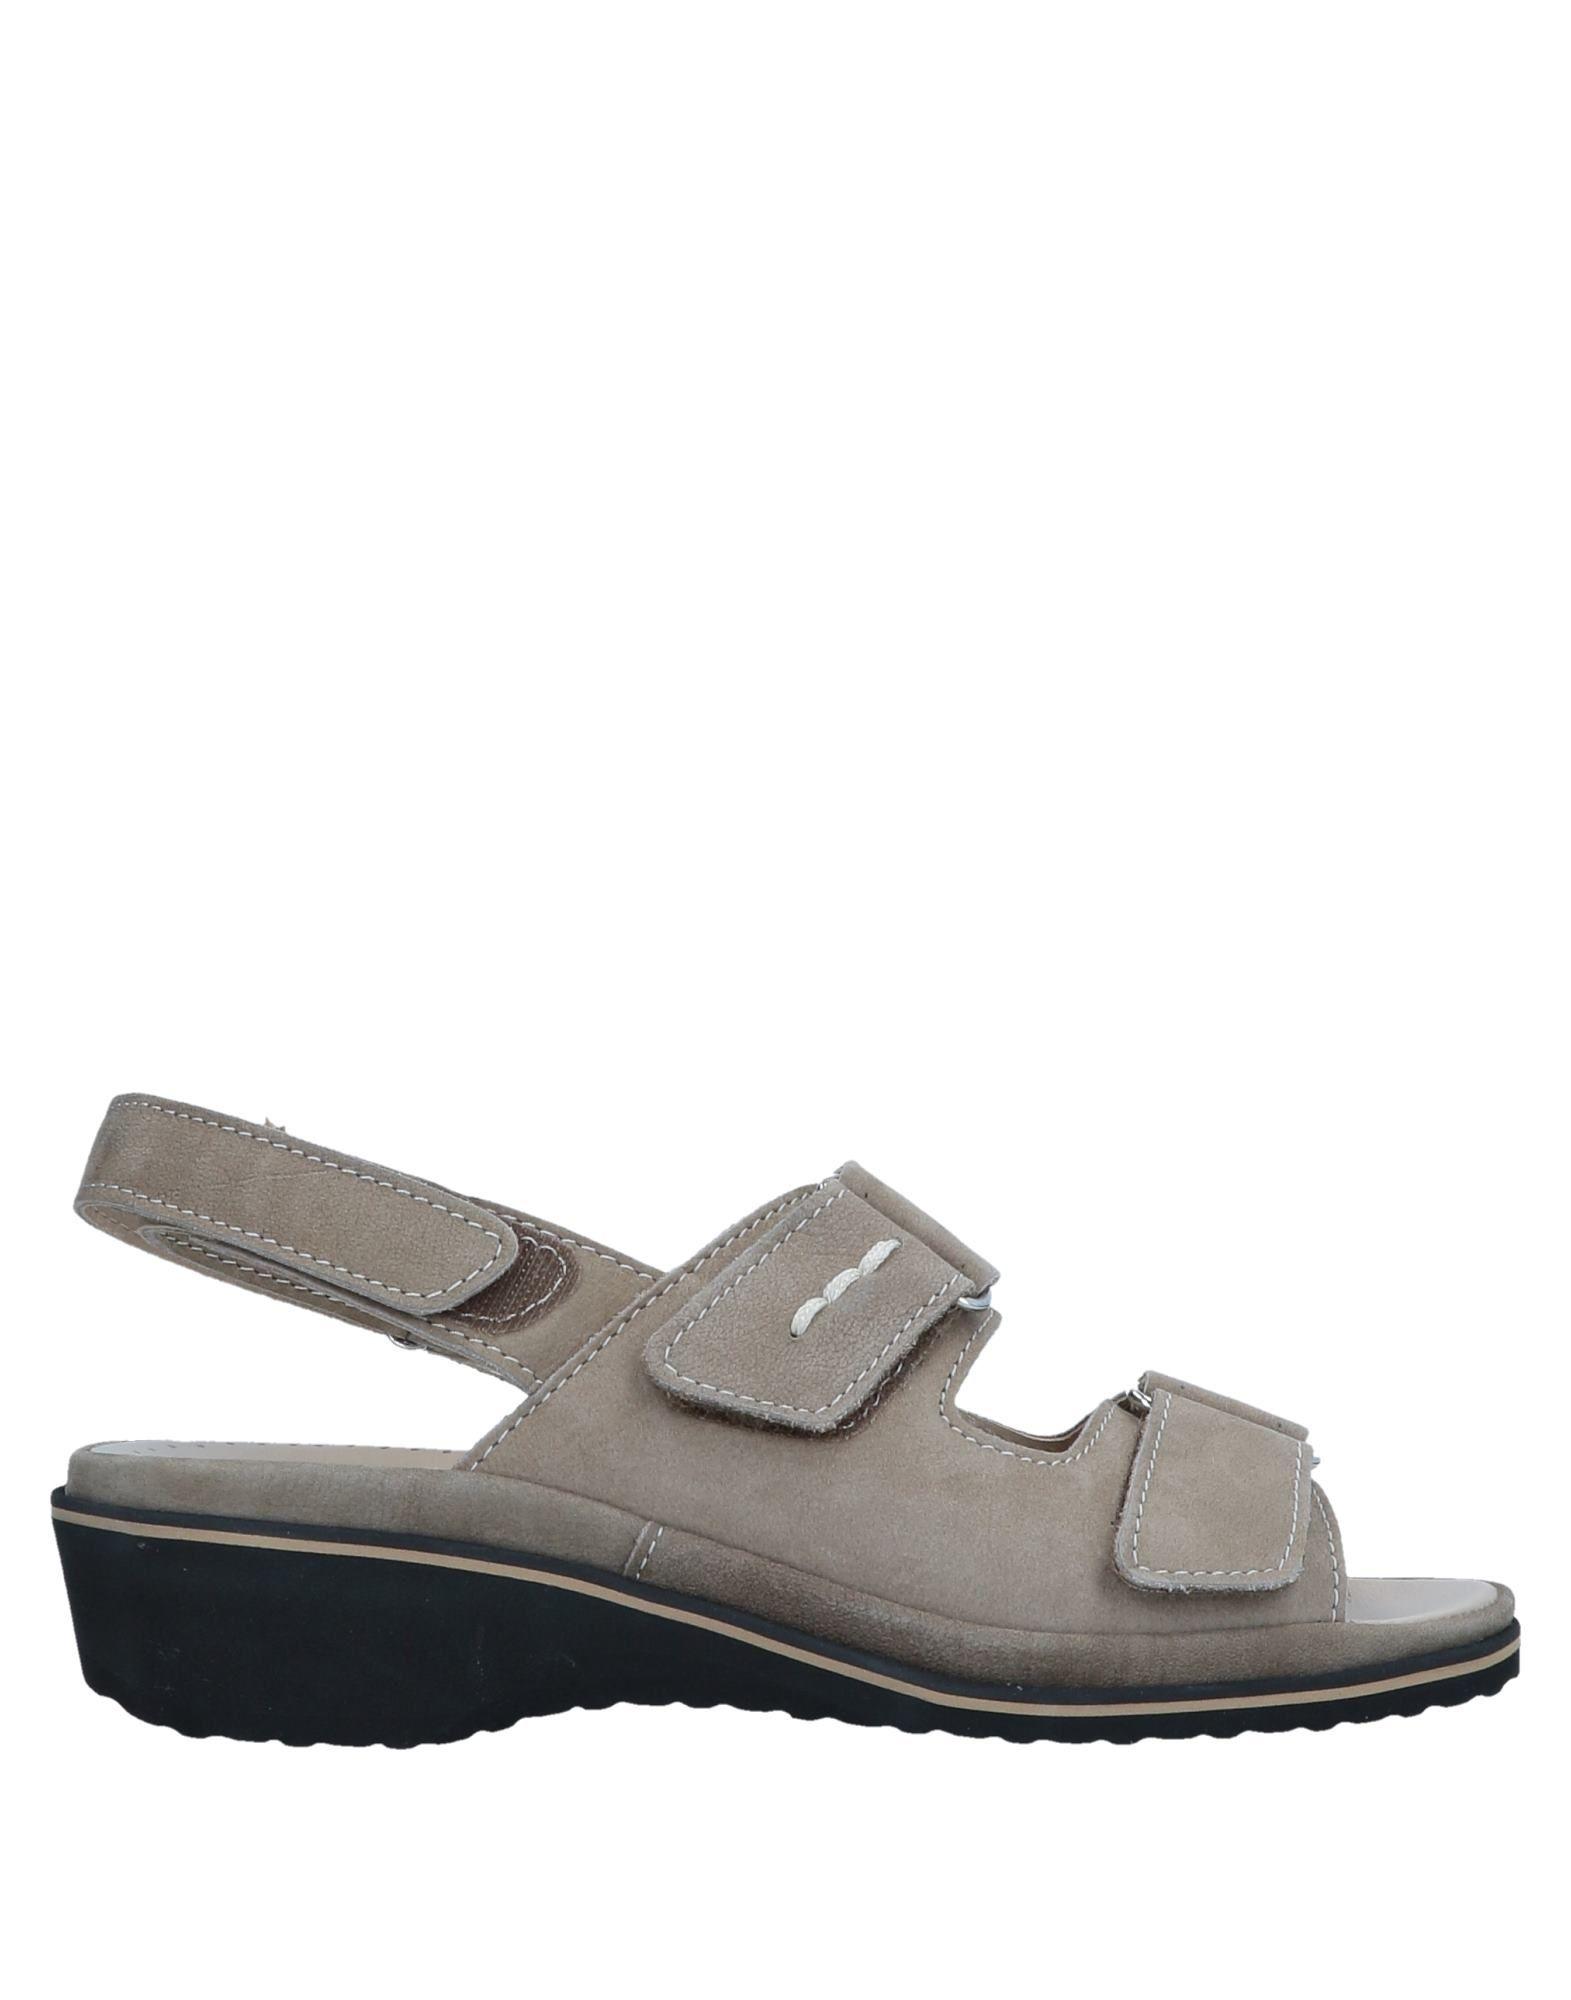 Cinzia Soft By Mauri Moda Sandalen Damen  11548815TV Gute Qualität beliebte Schuhe